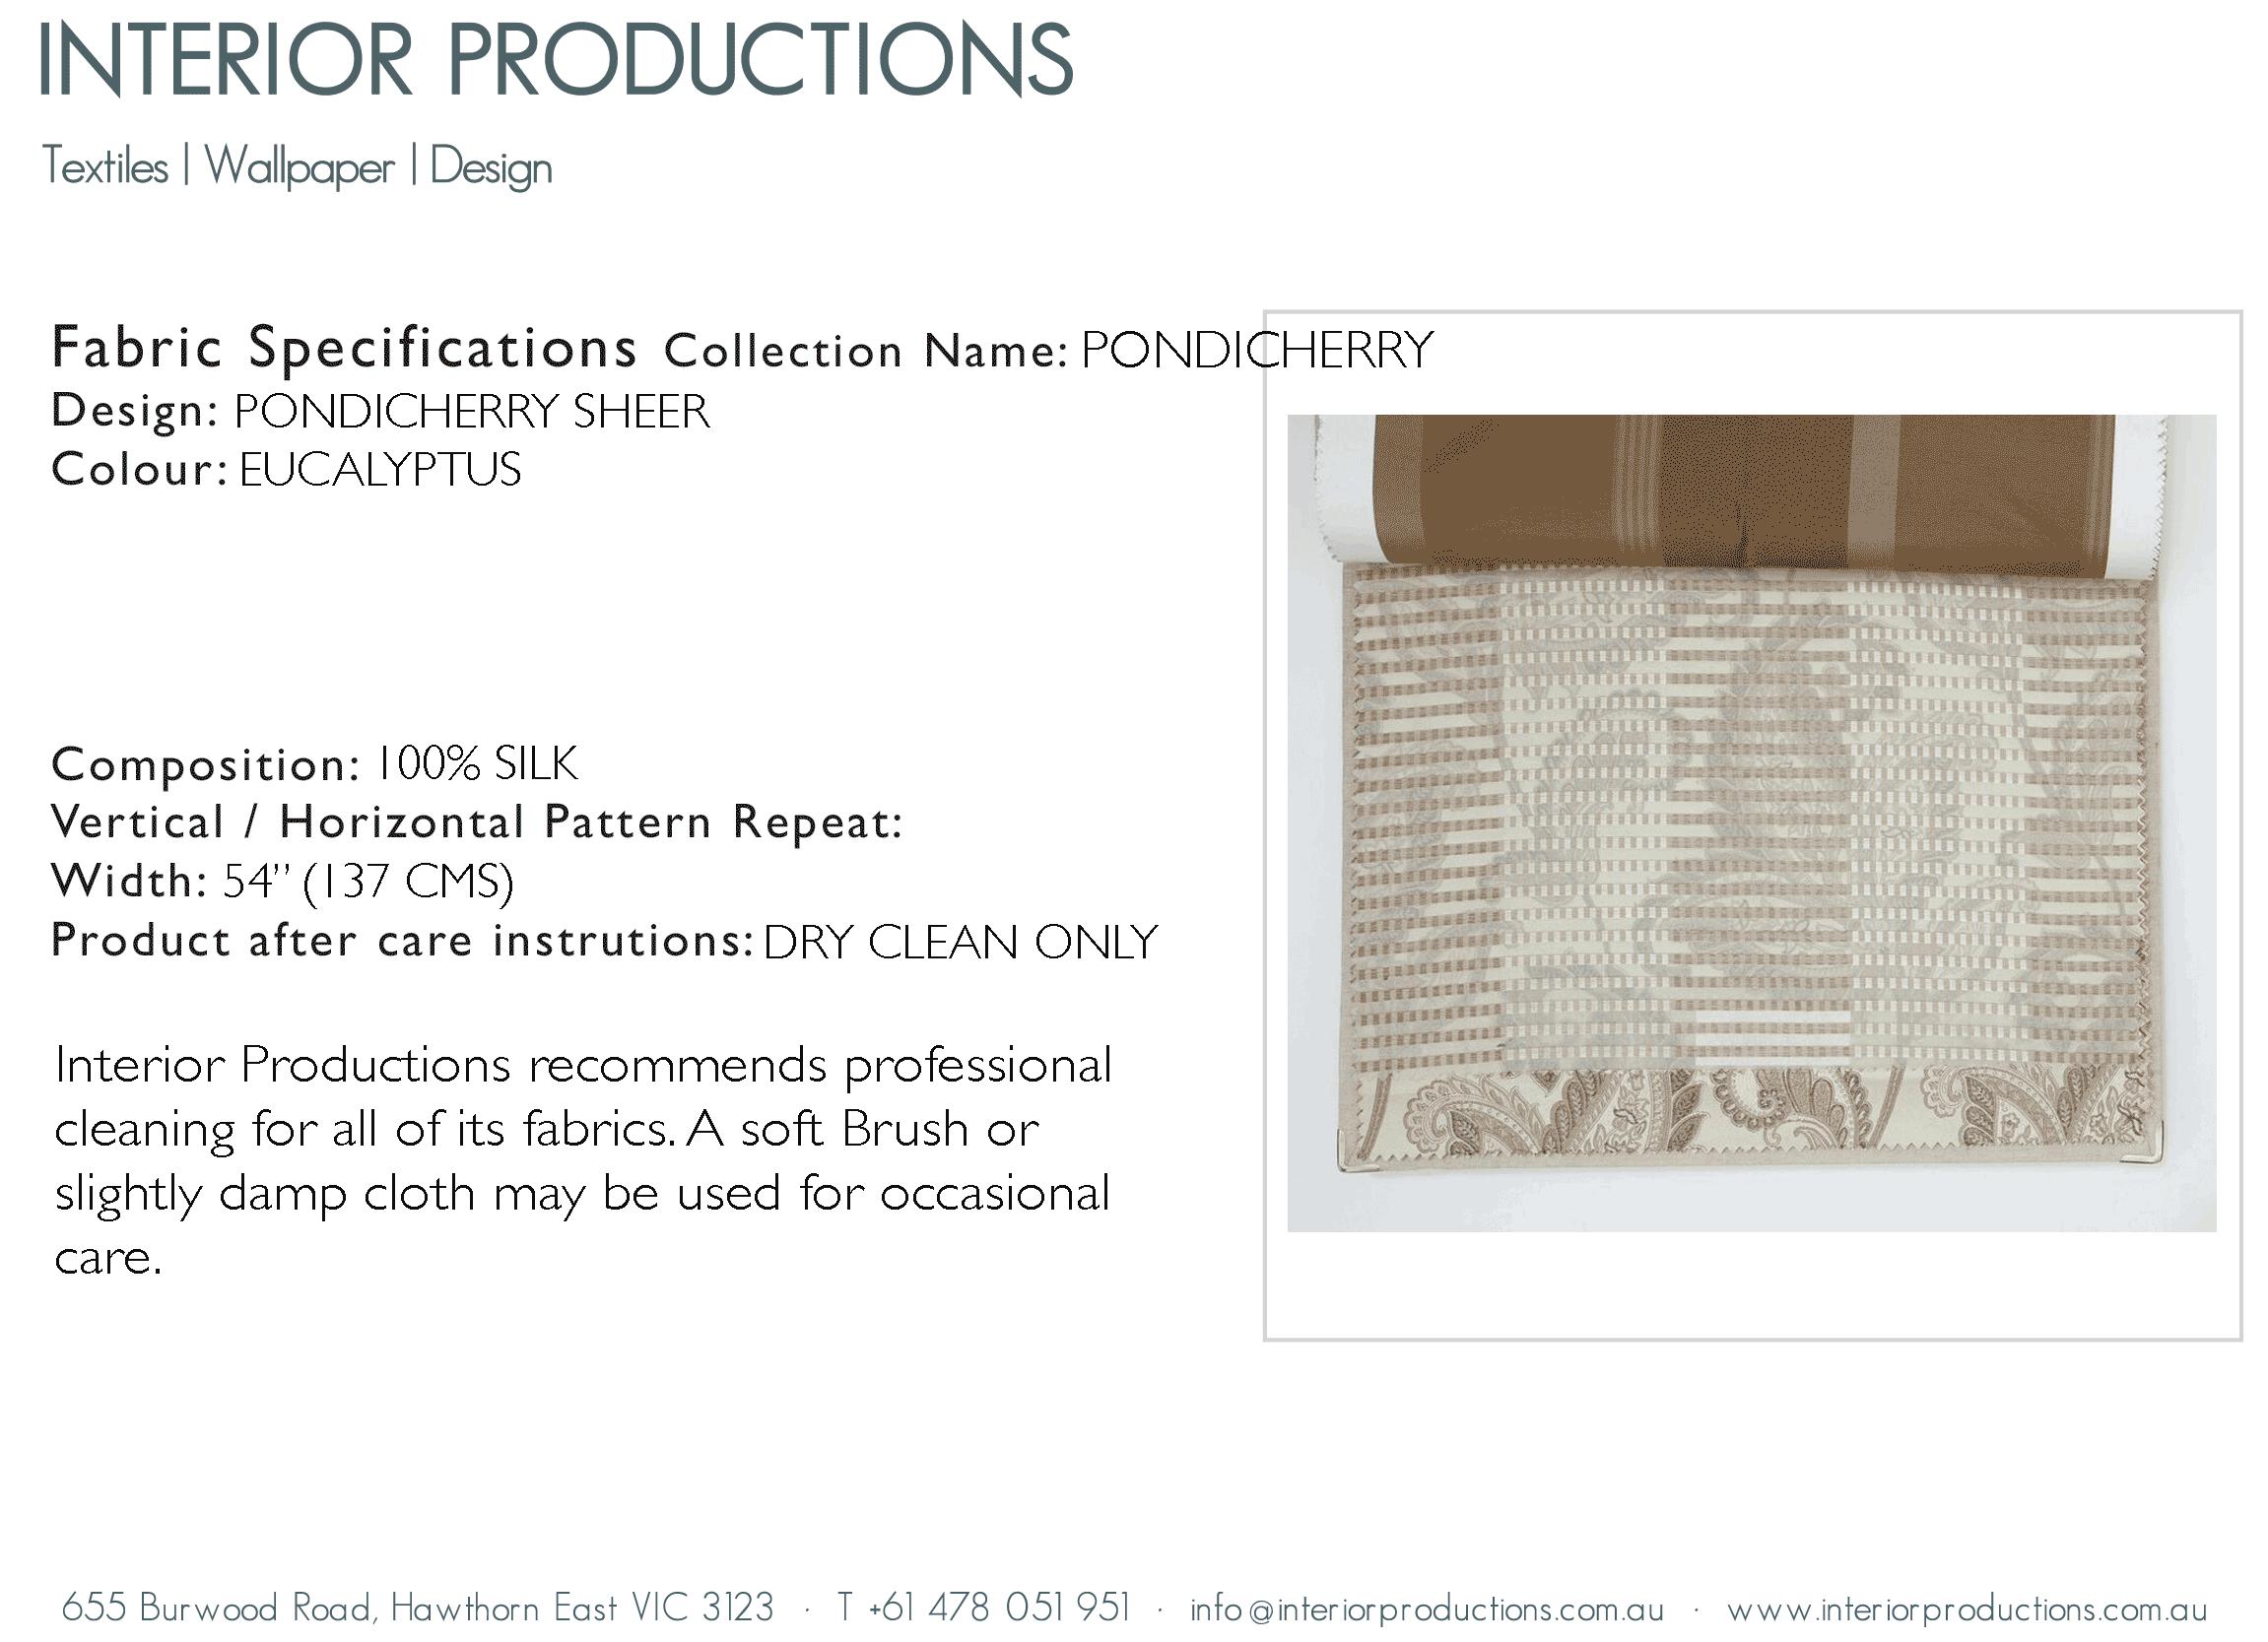 interior_productions_PONDICHERRY-SHEER---EUCALYPTUS